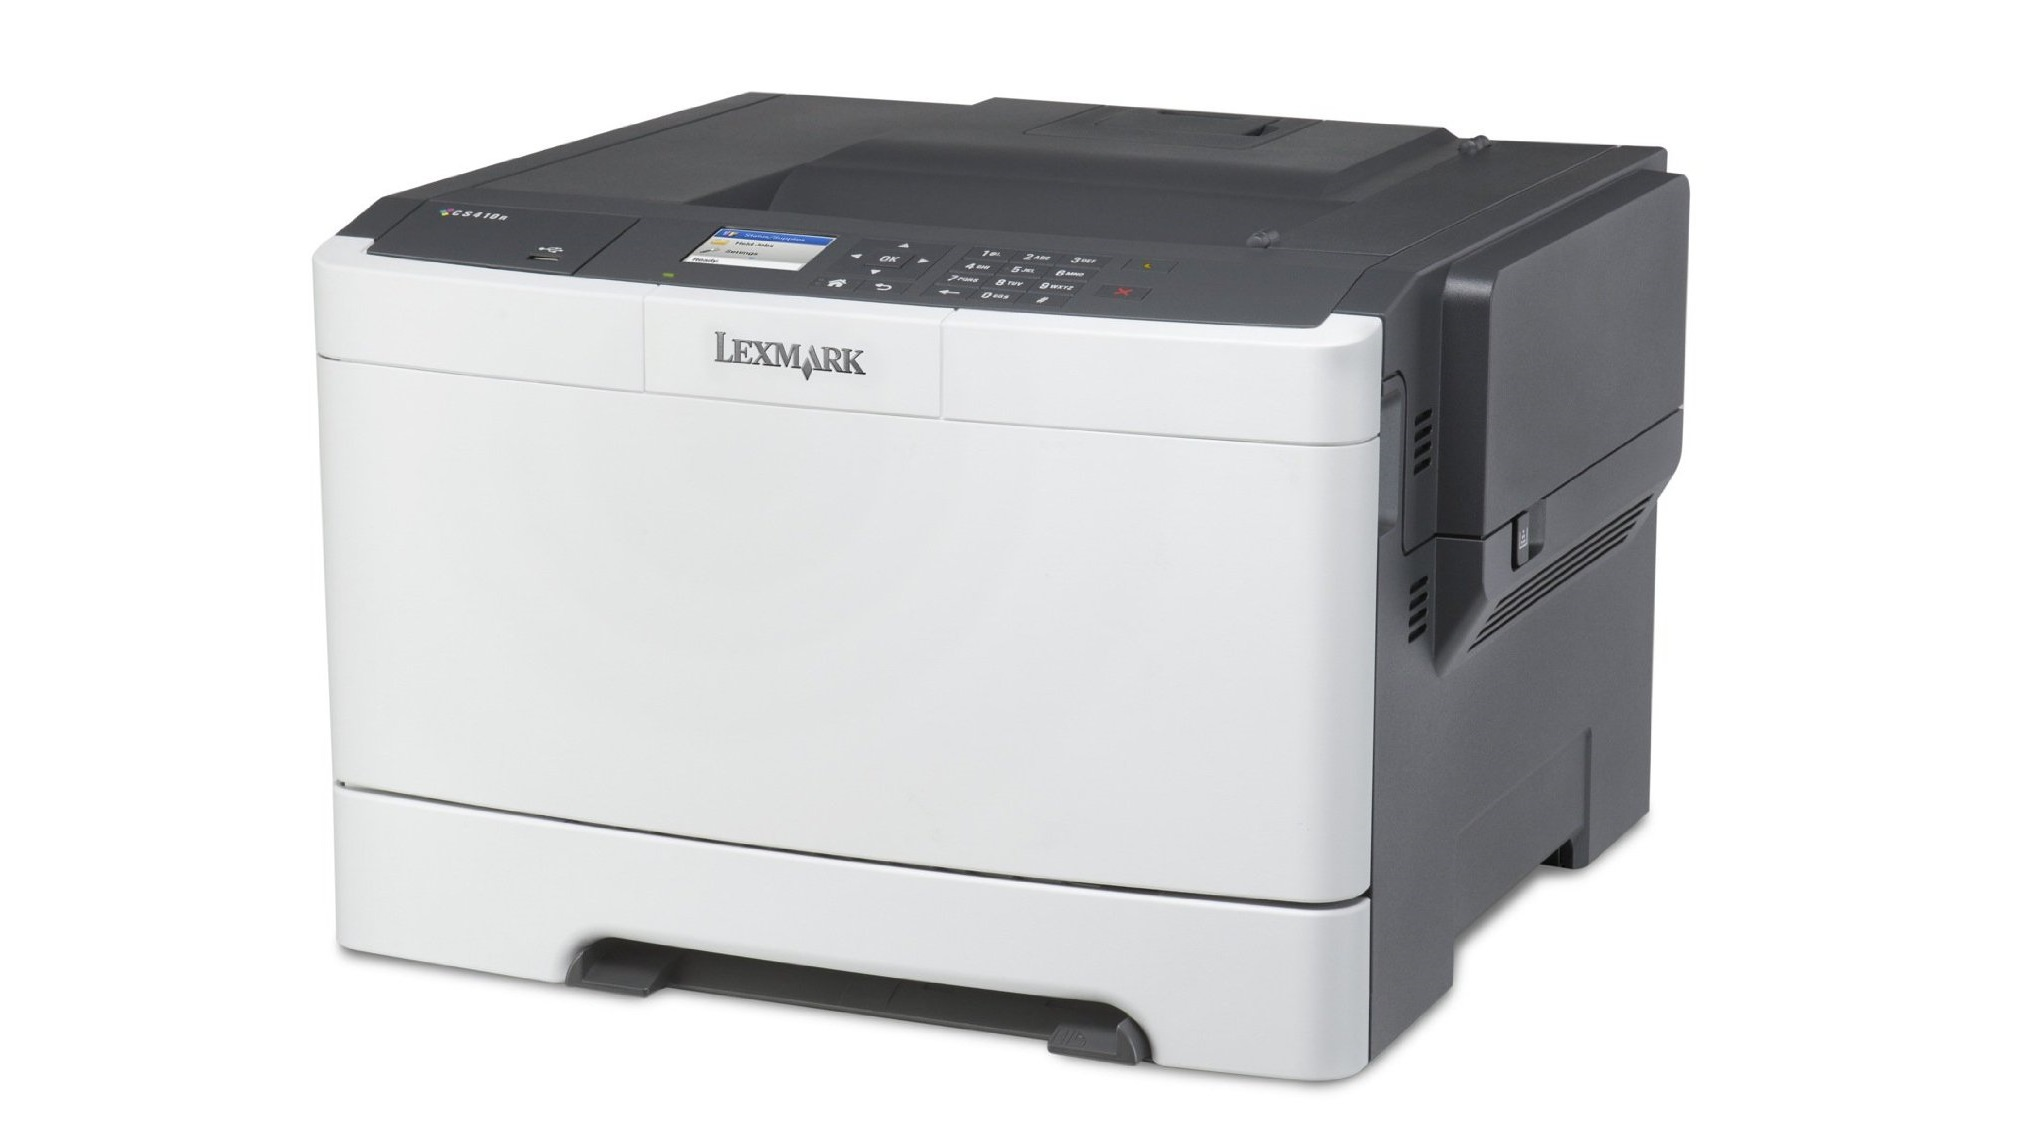 Lexmark CS410dn,A4,1200x1200dpi,30ppm,duplex,LAN